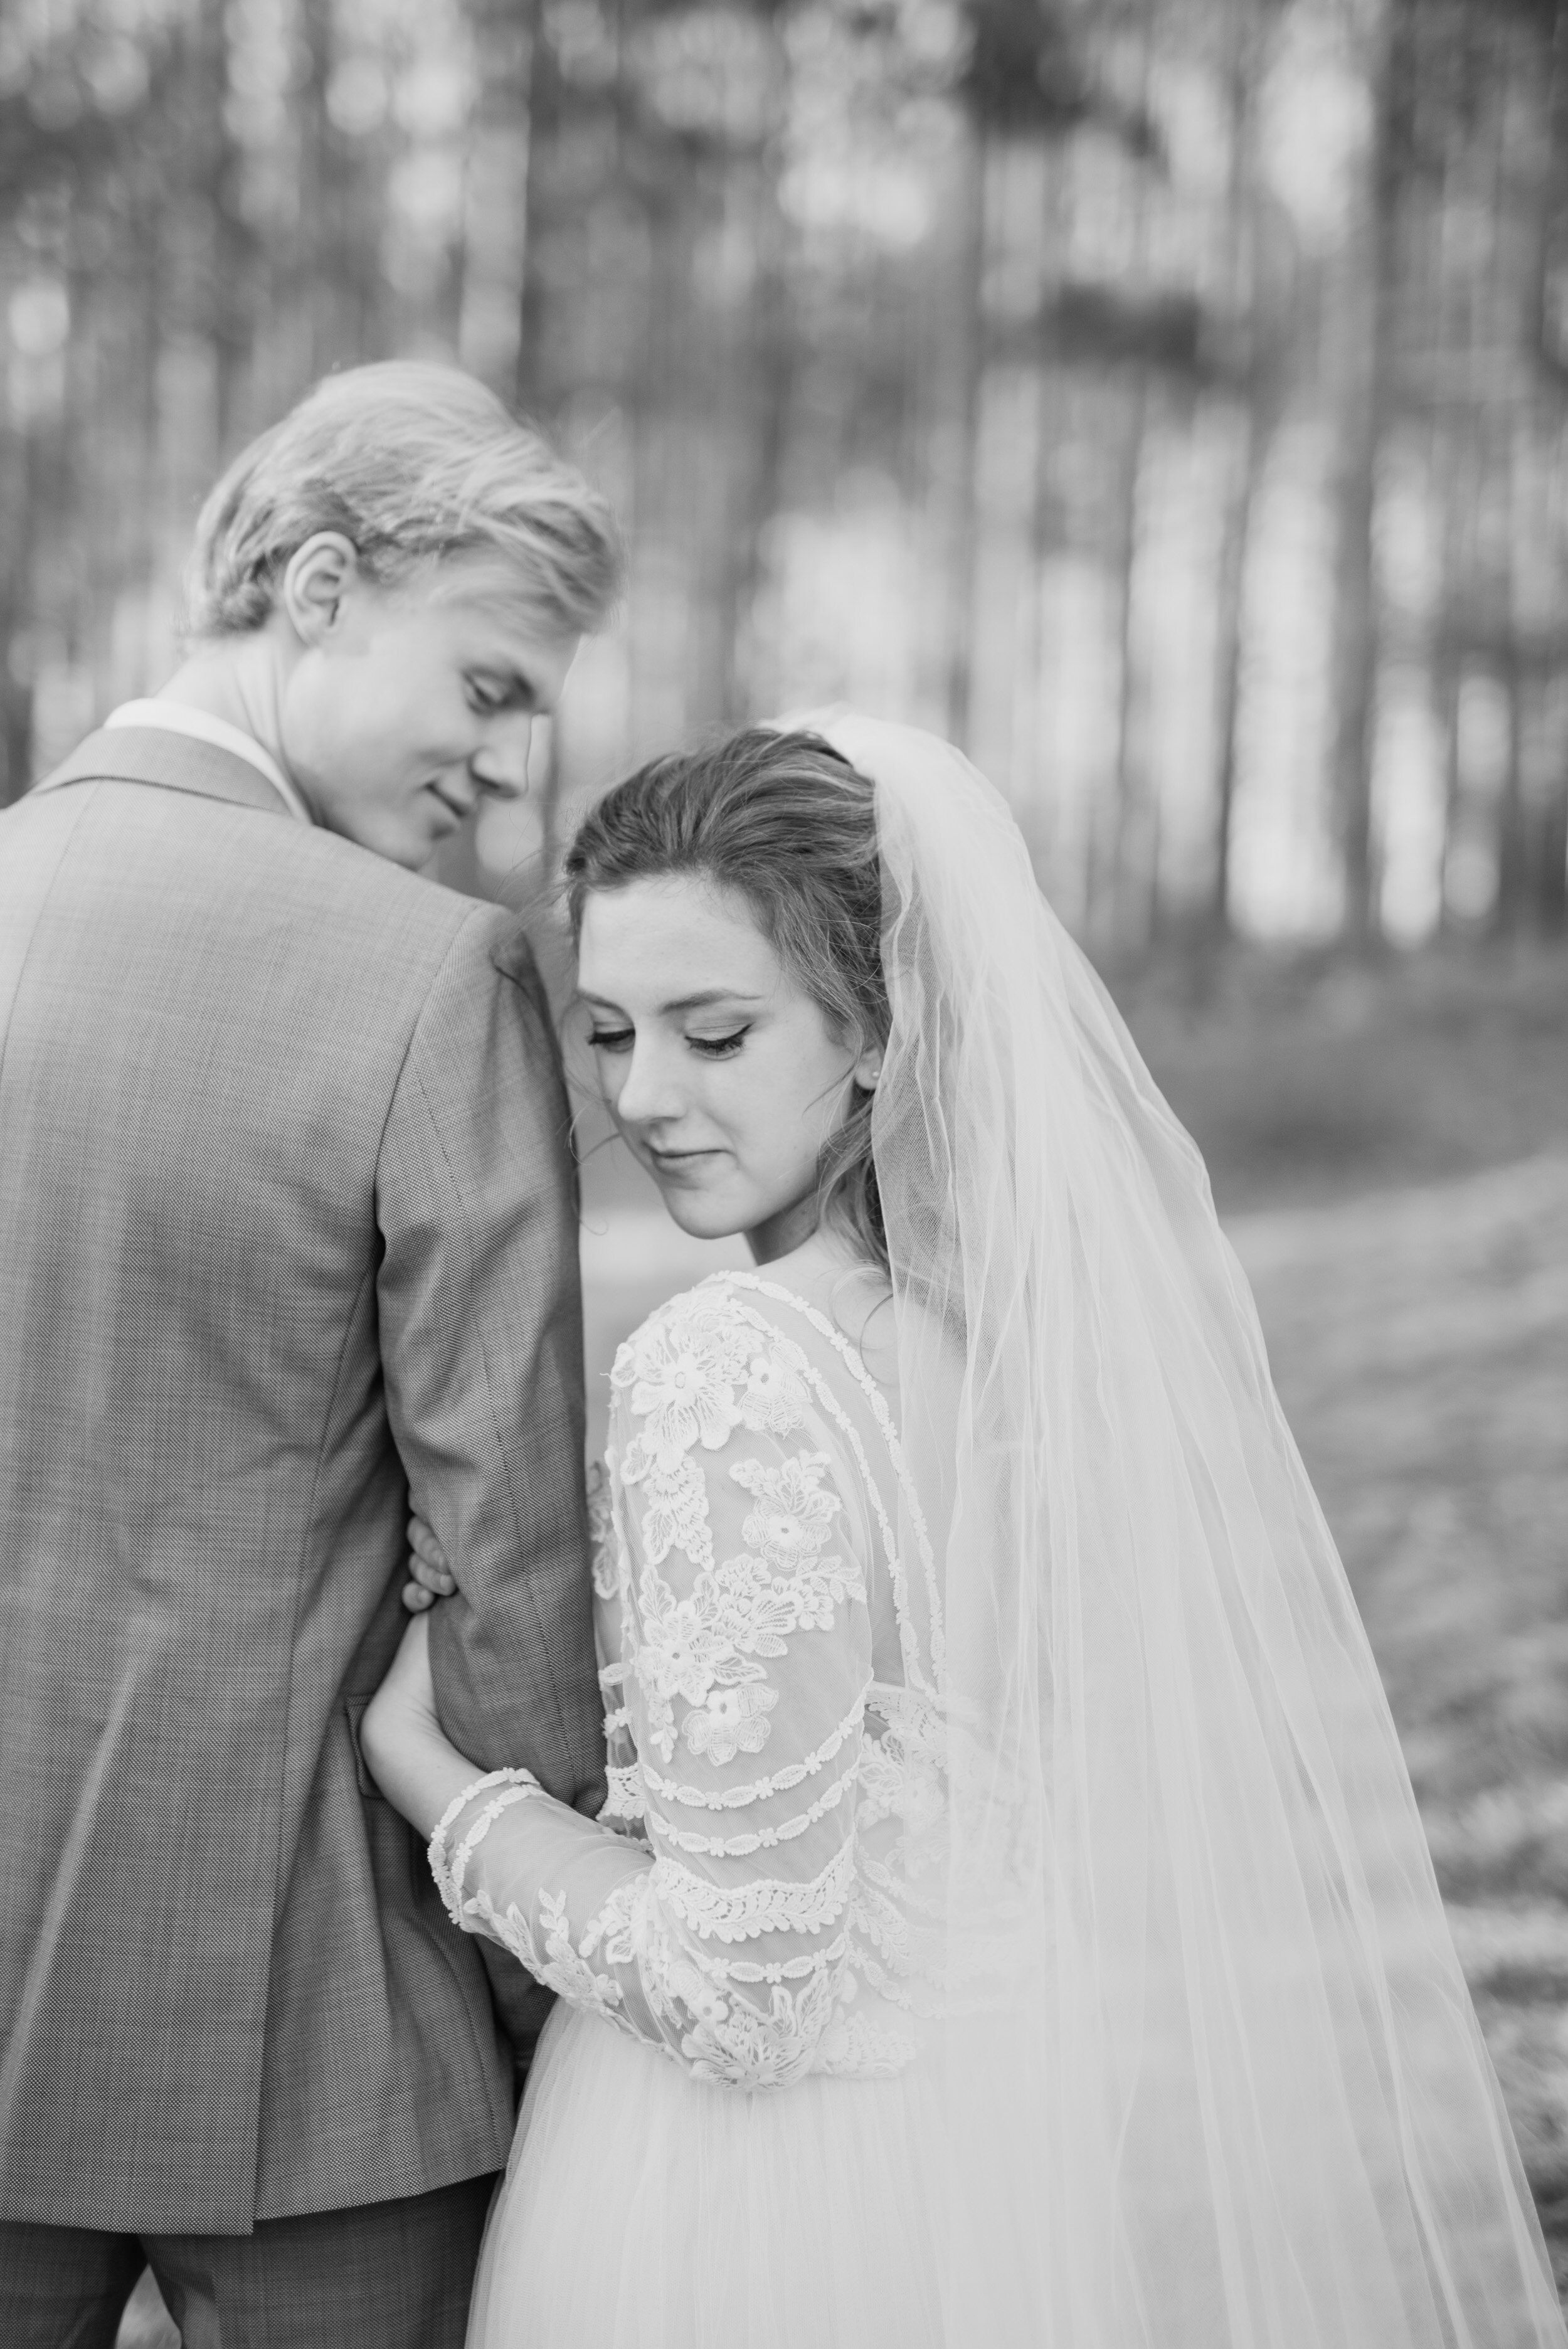 cleland-fine-art-wedding-photography-7.jpg